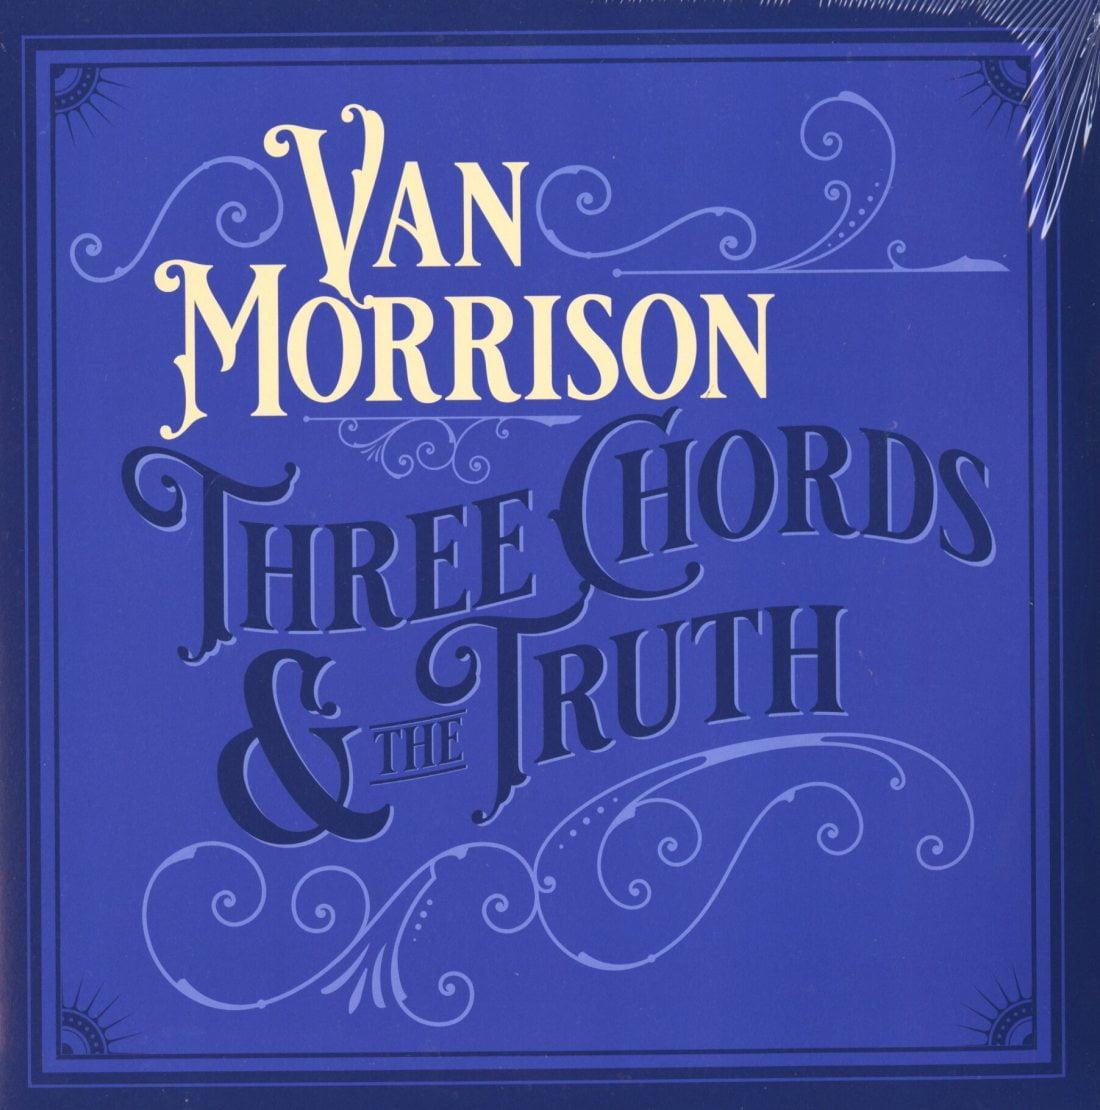 Van Morrison - Three Chords - White, Colored Vinyl, Double Vinyl, Caroline Records, 2019